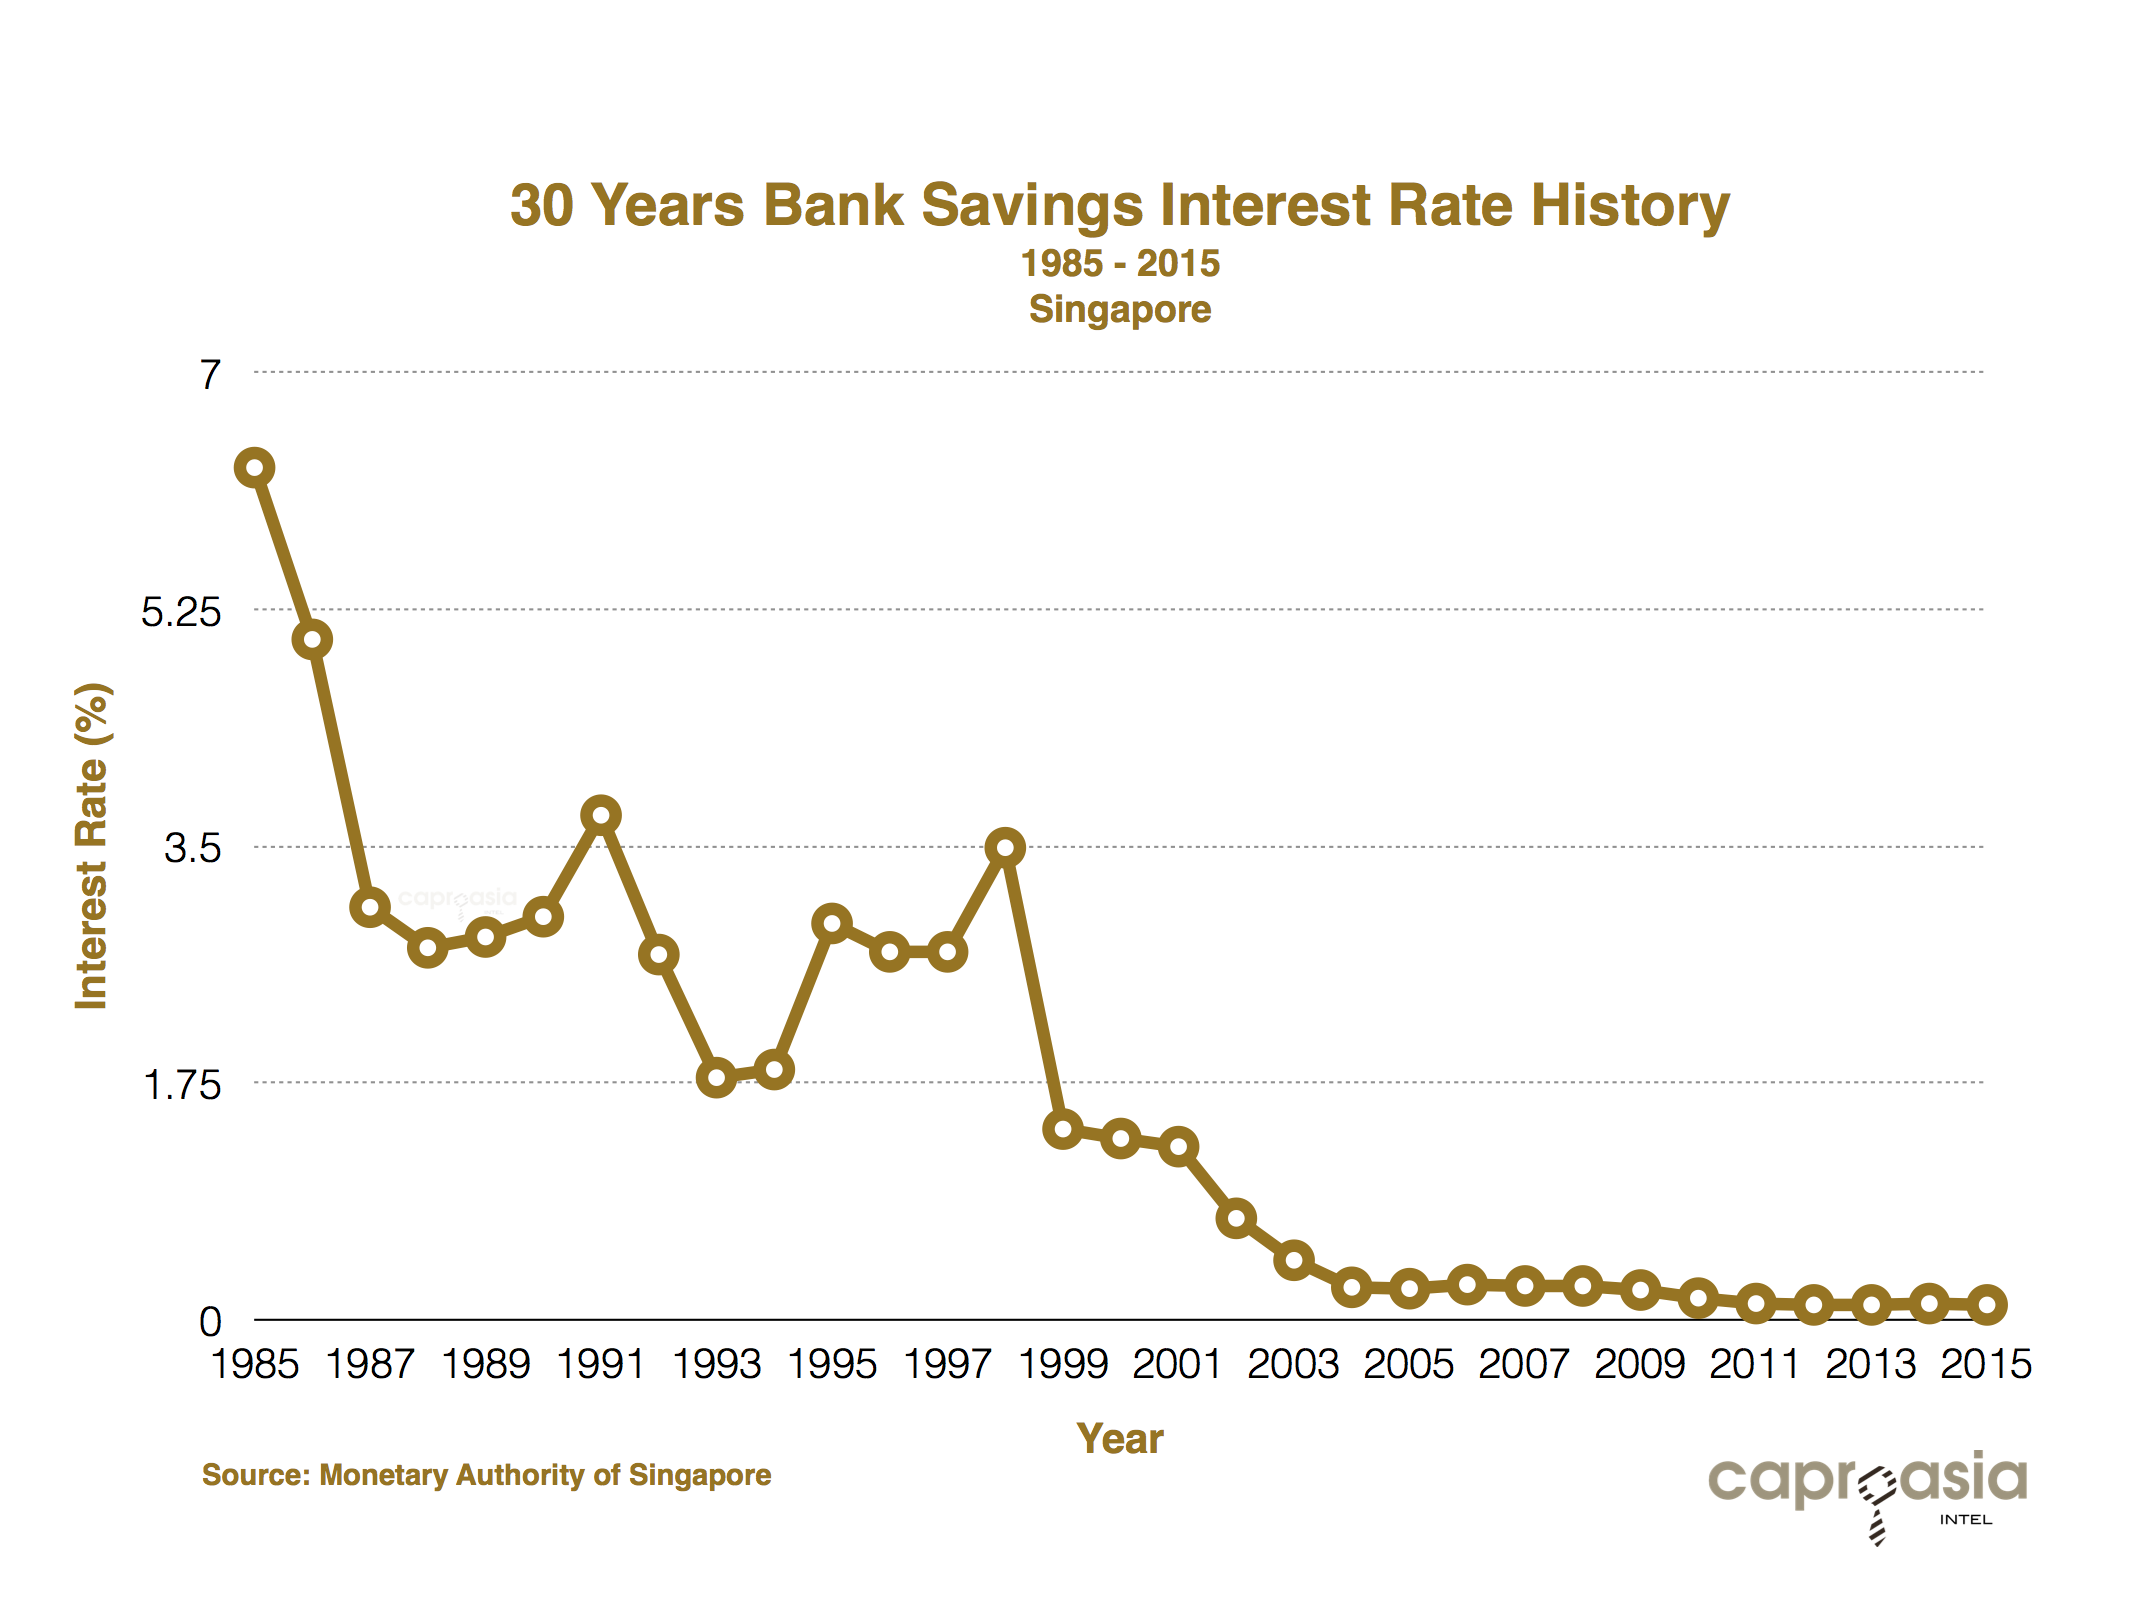 30 Years Bank Savings Interest Rate History Singapore Chart 1985-2015